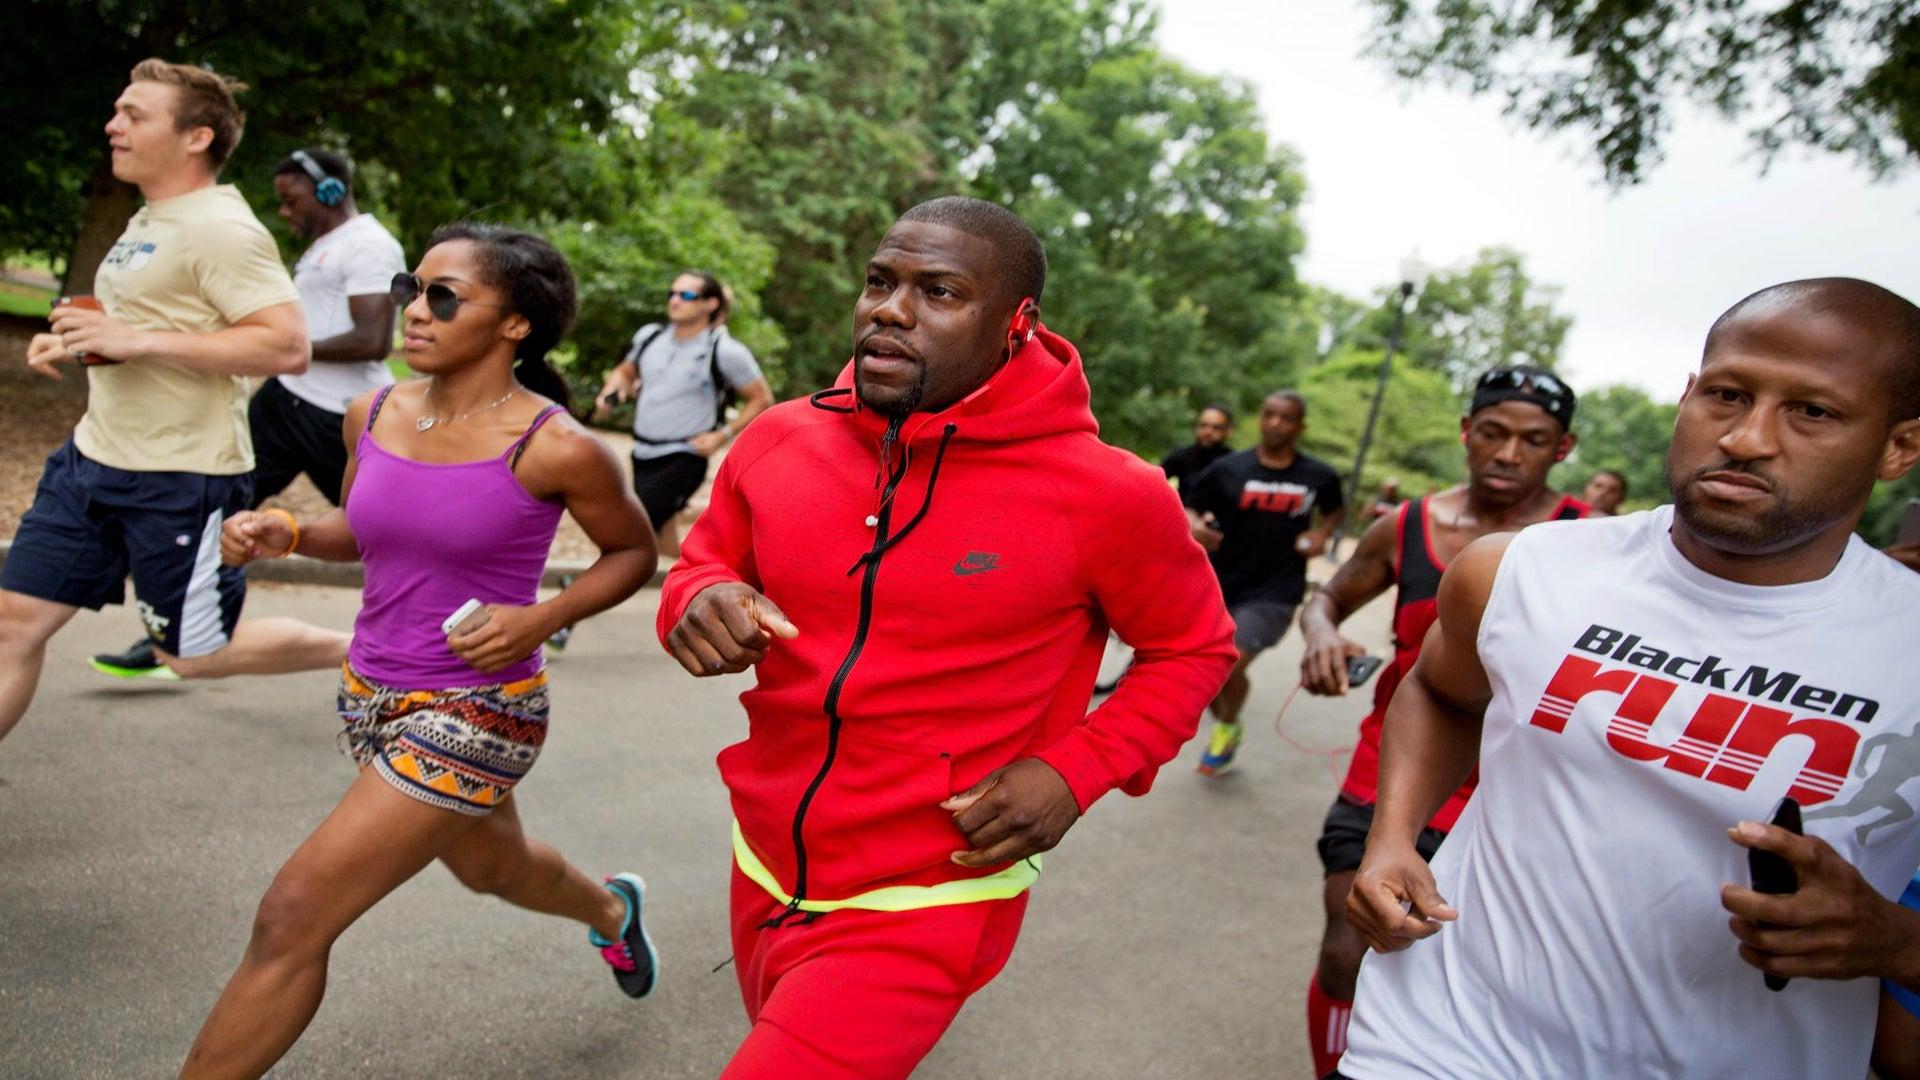 Kevin Hart Motivates Man to Finish Spontaneous 5K Run in Dallas